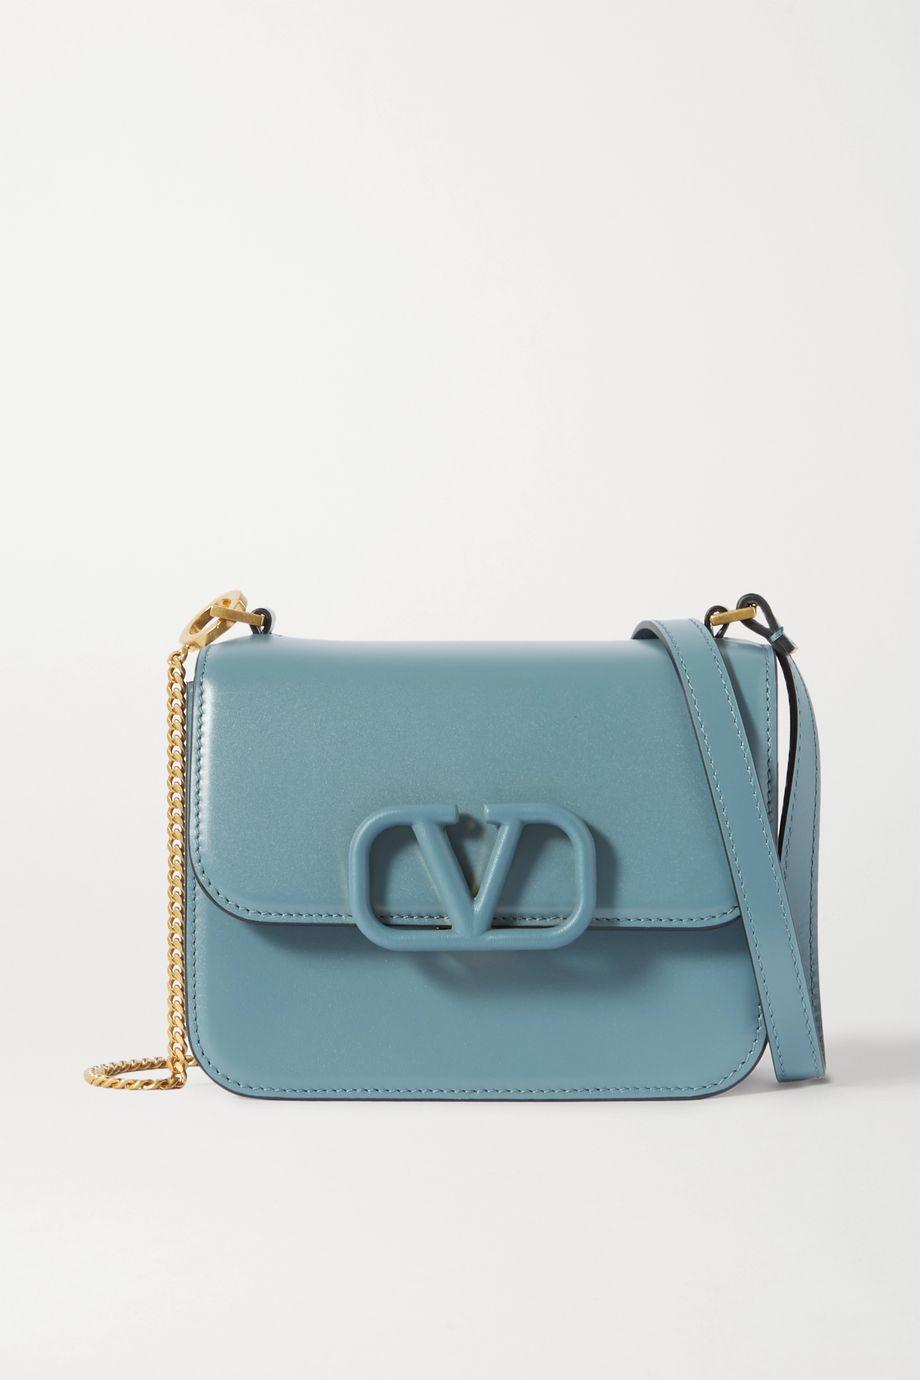 Valentino Valentino Garavani VSLING small leather shoulder bag